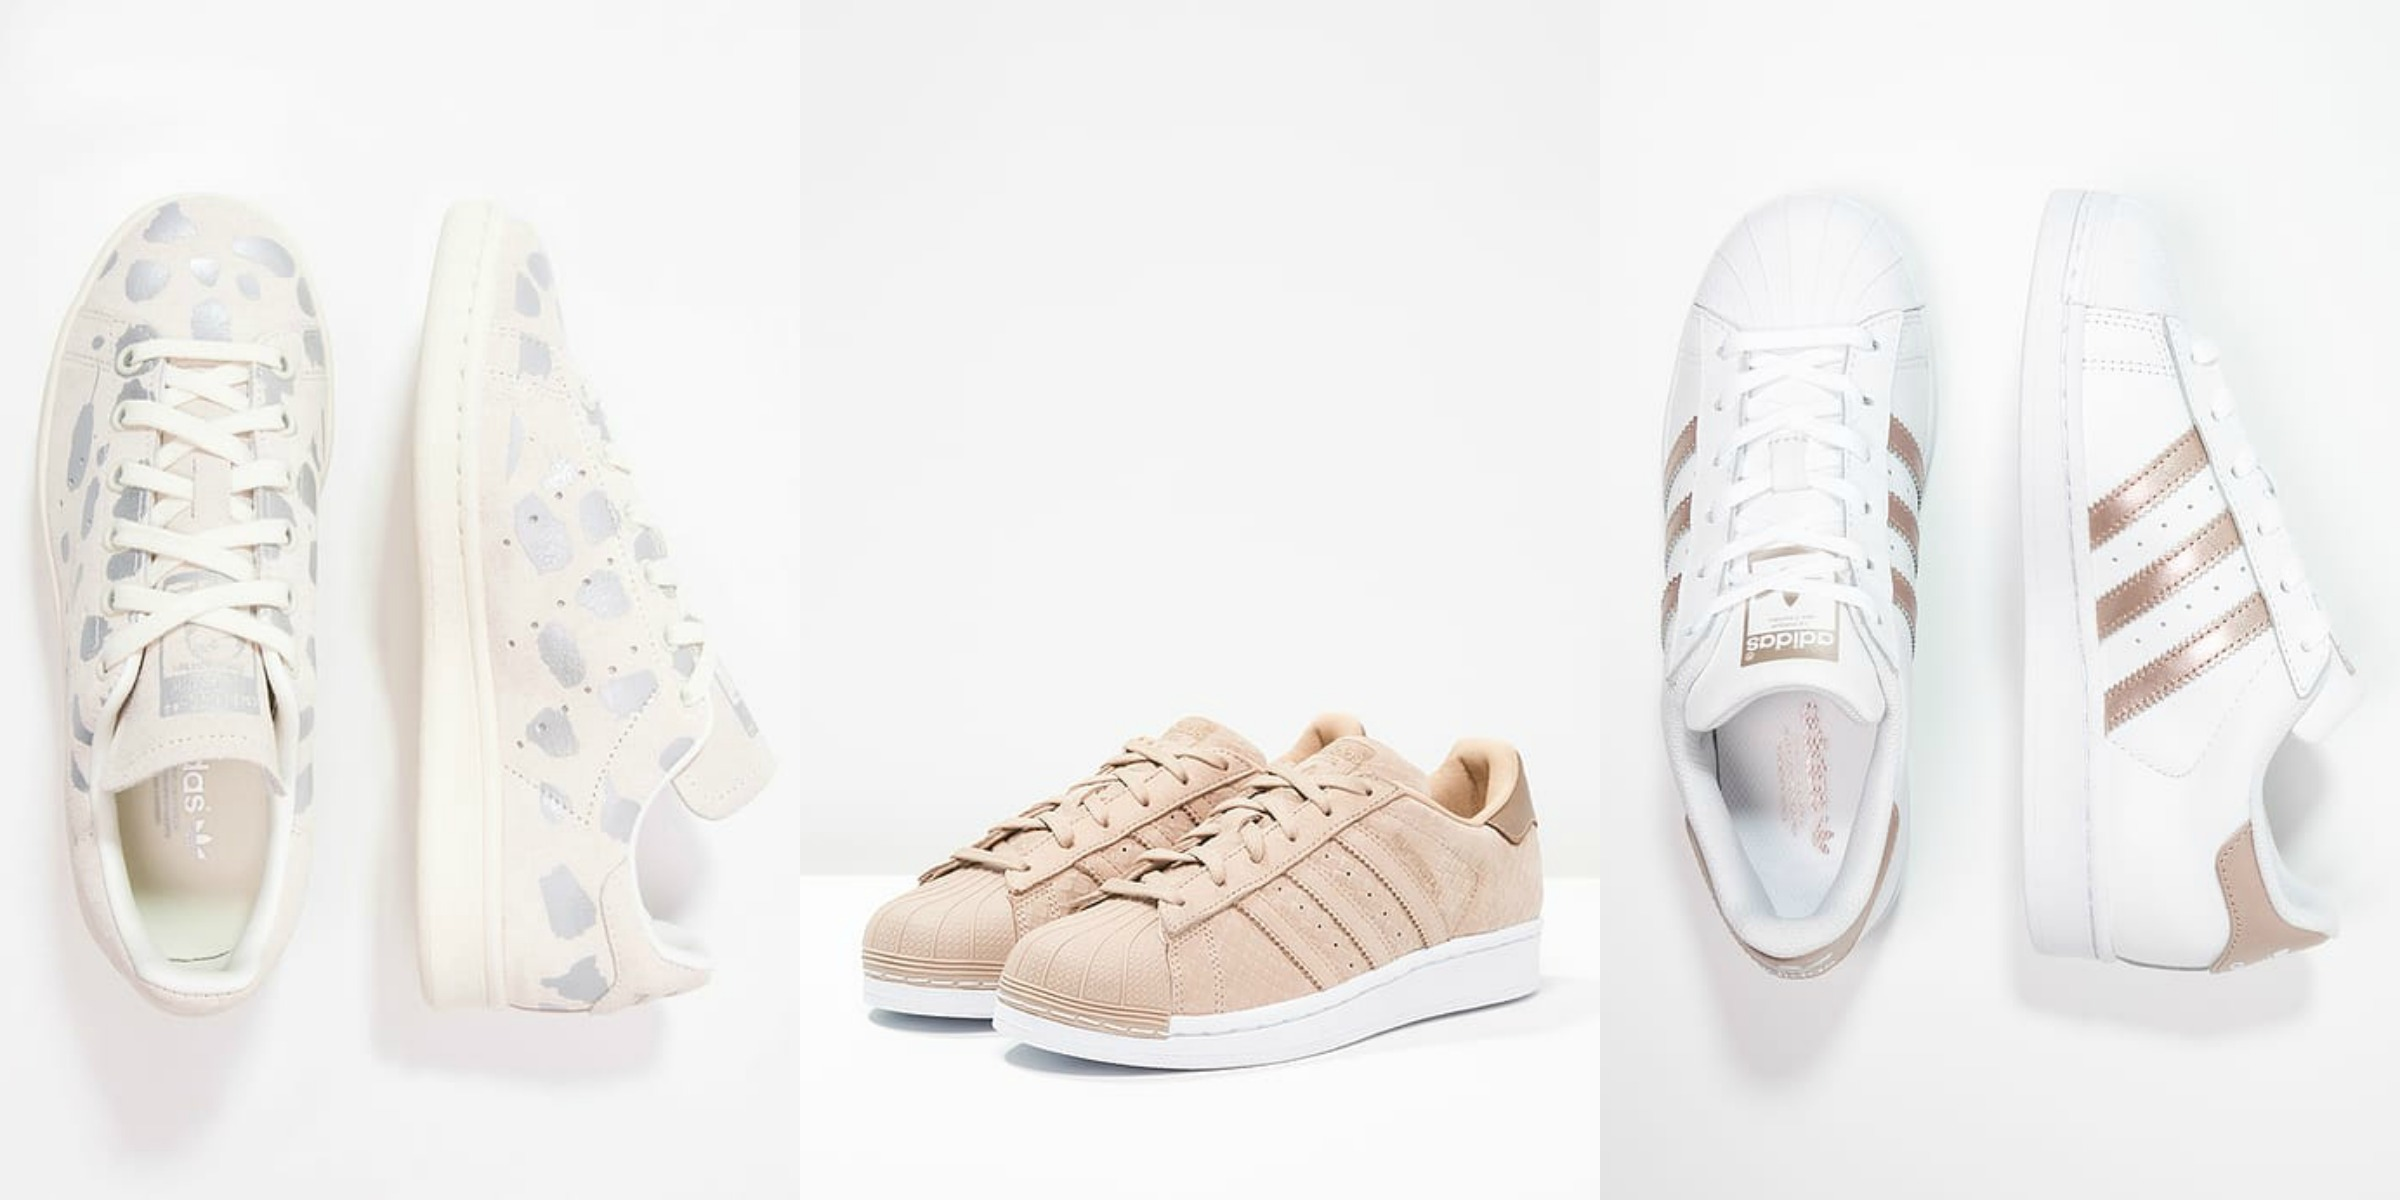 FASHION   De mooiste sneakers voor dit seizoen